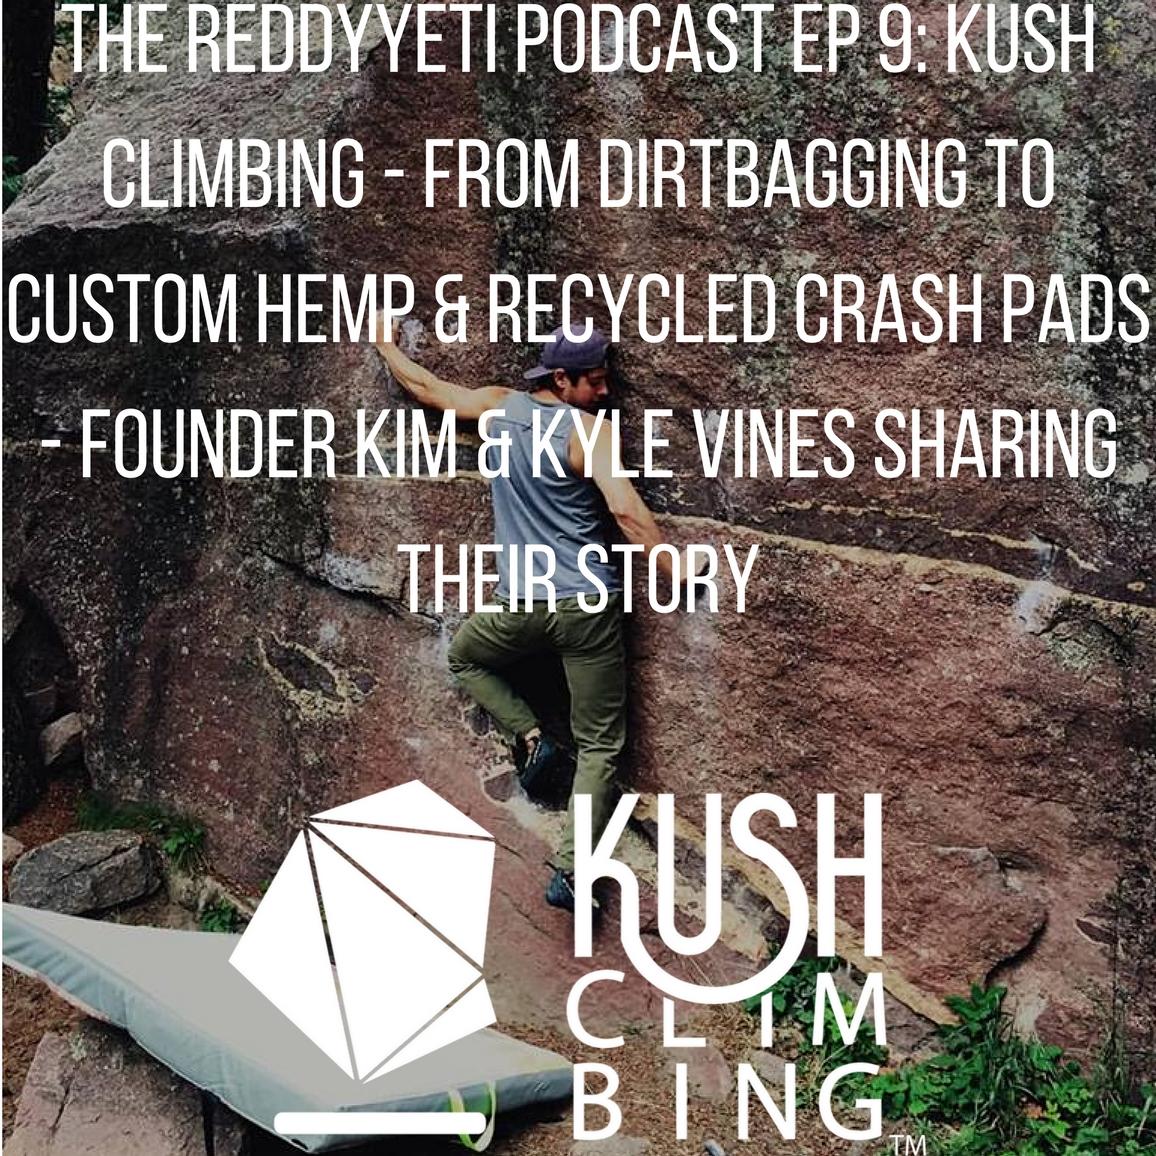 Kush climbing podcast image (1).jpg